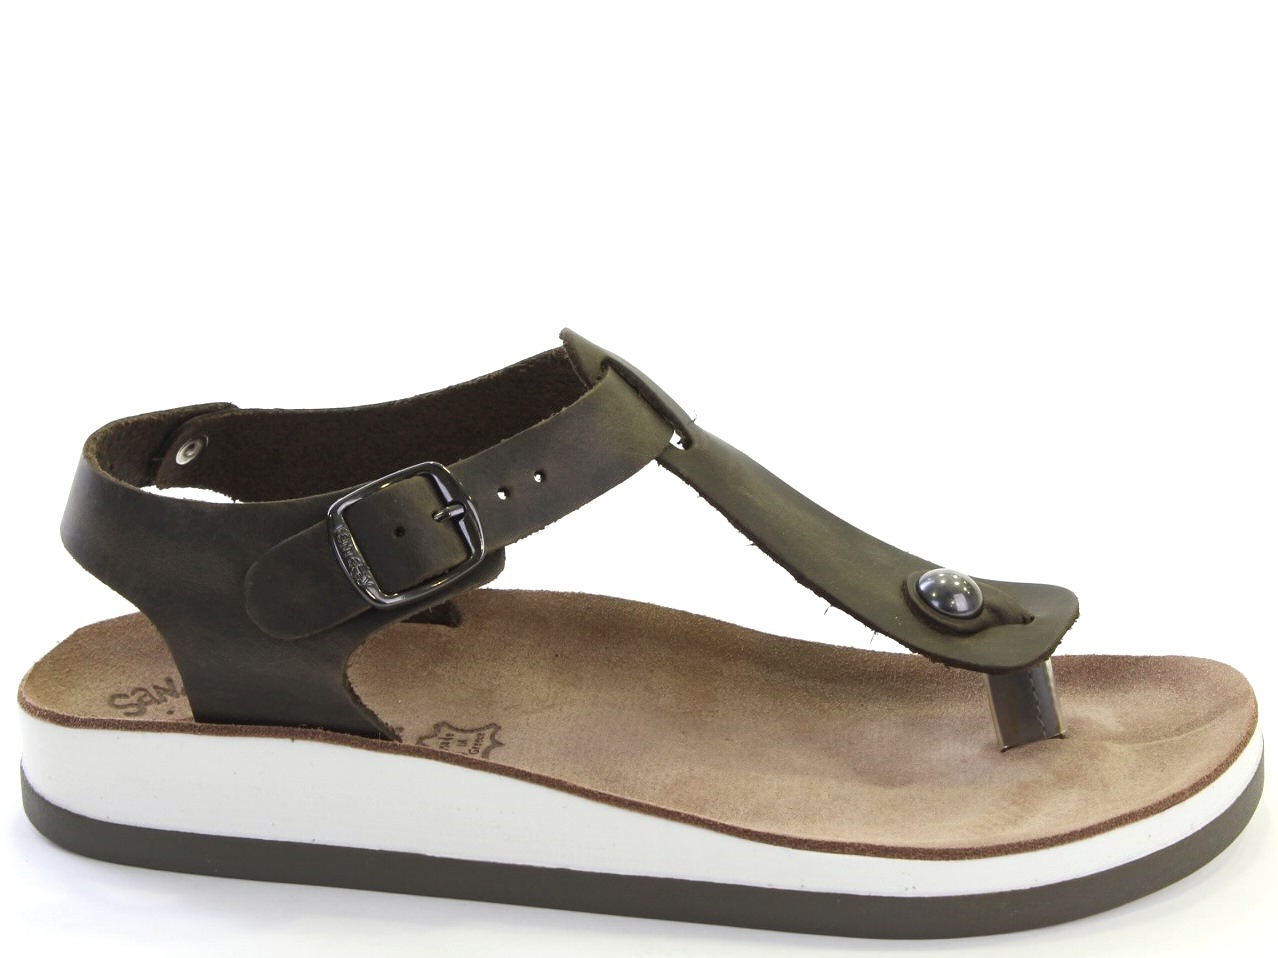 Flat Sandals Fantasy Sandals - 662 S3001 JULES